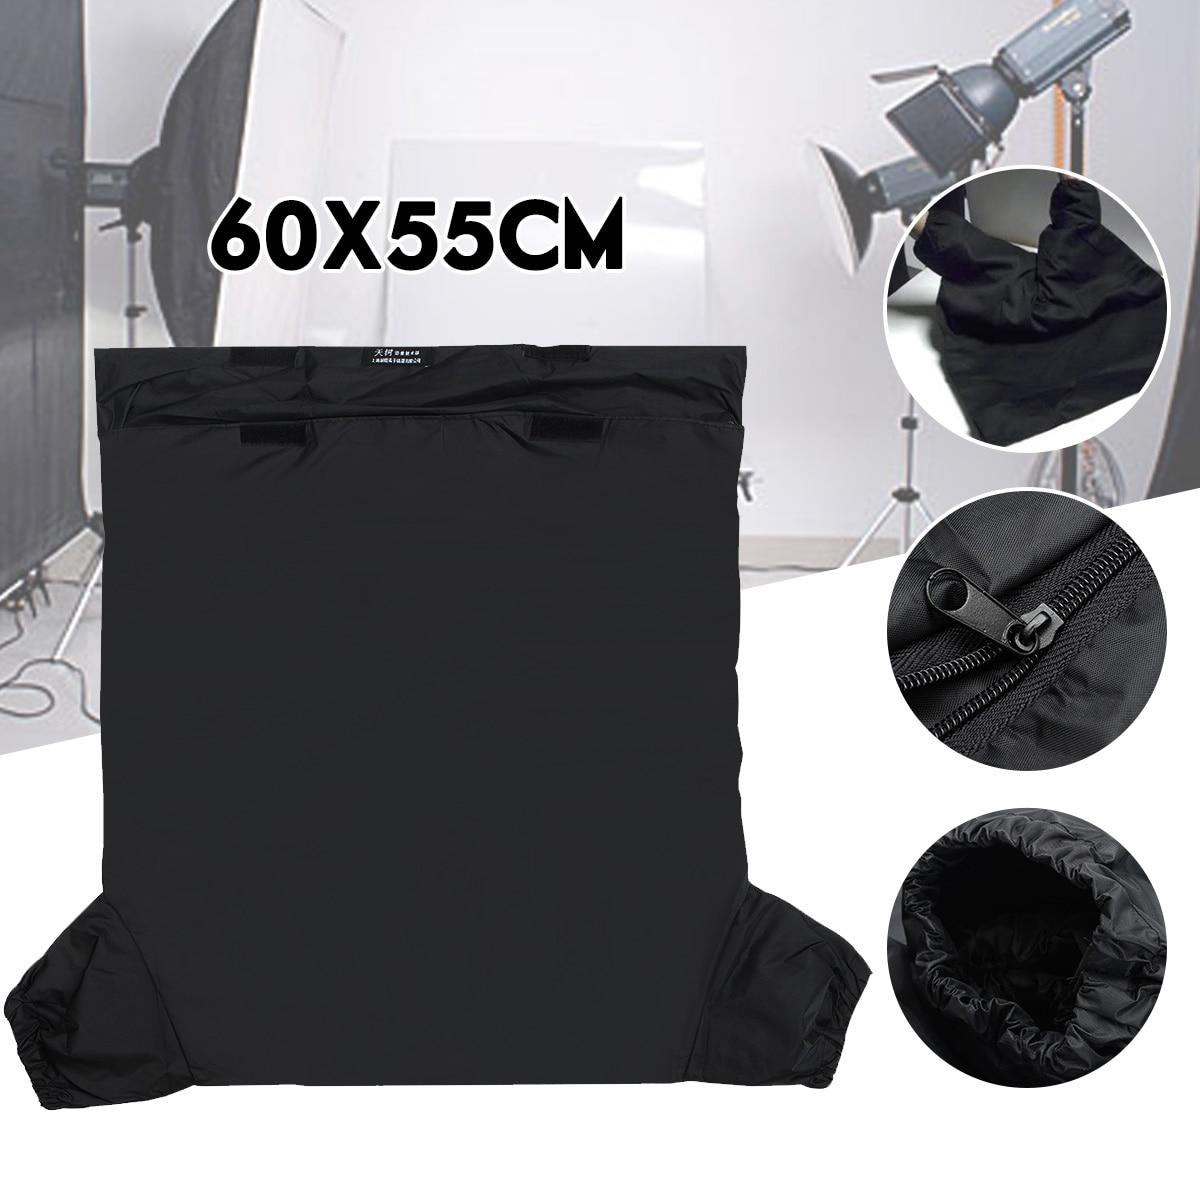 60cm x 55cm New Portable Darkroom Camera Film Changing Bag  Load Photography Zipper Camera Bag|Photo Studio Accessories|   - AliExpress